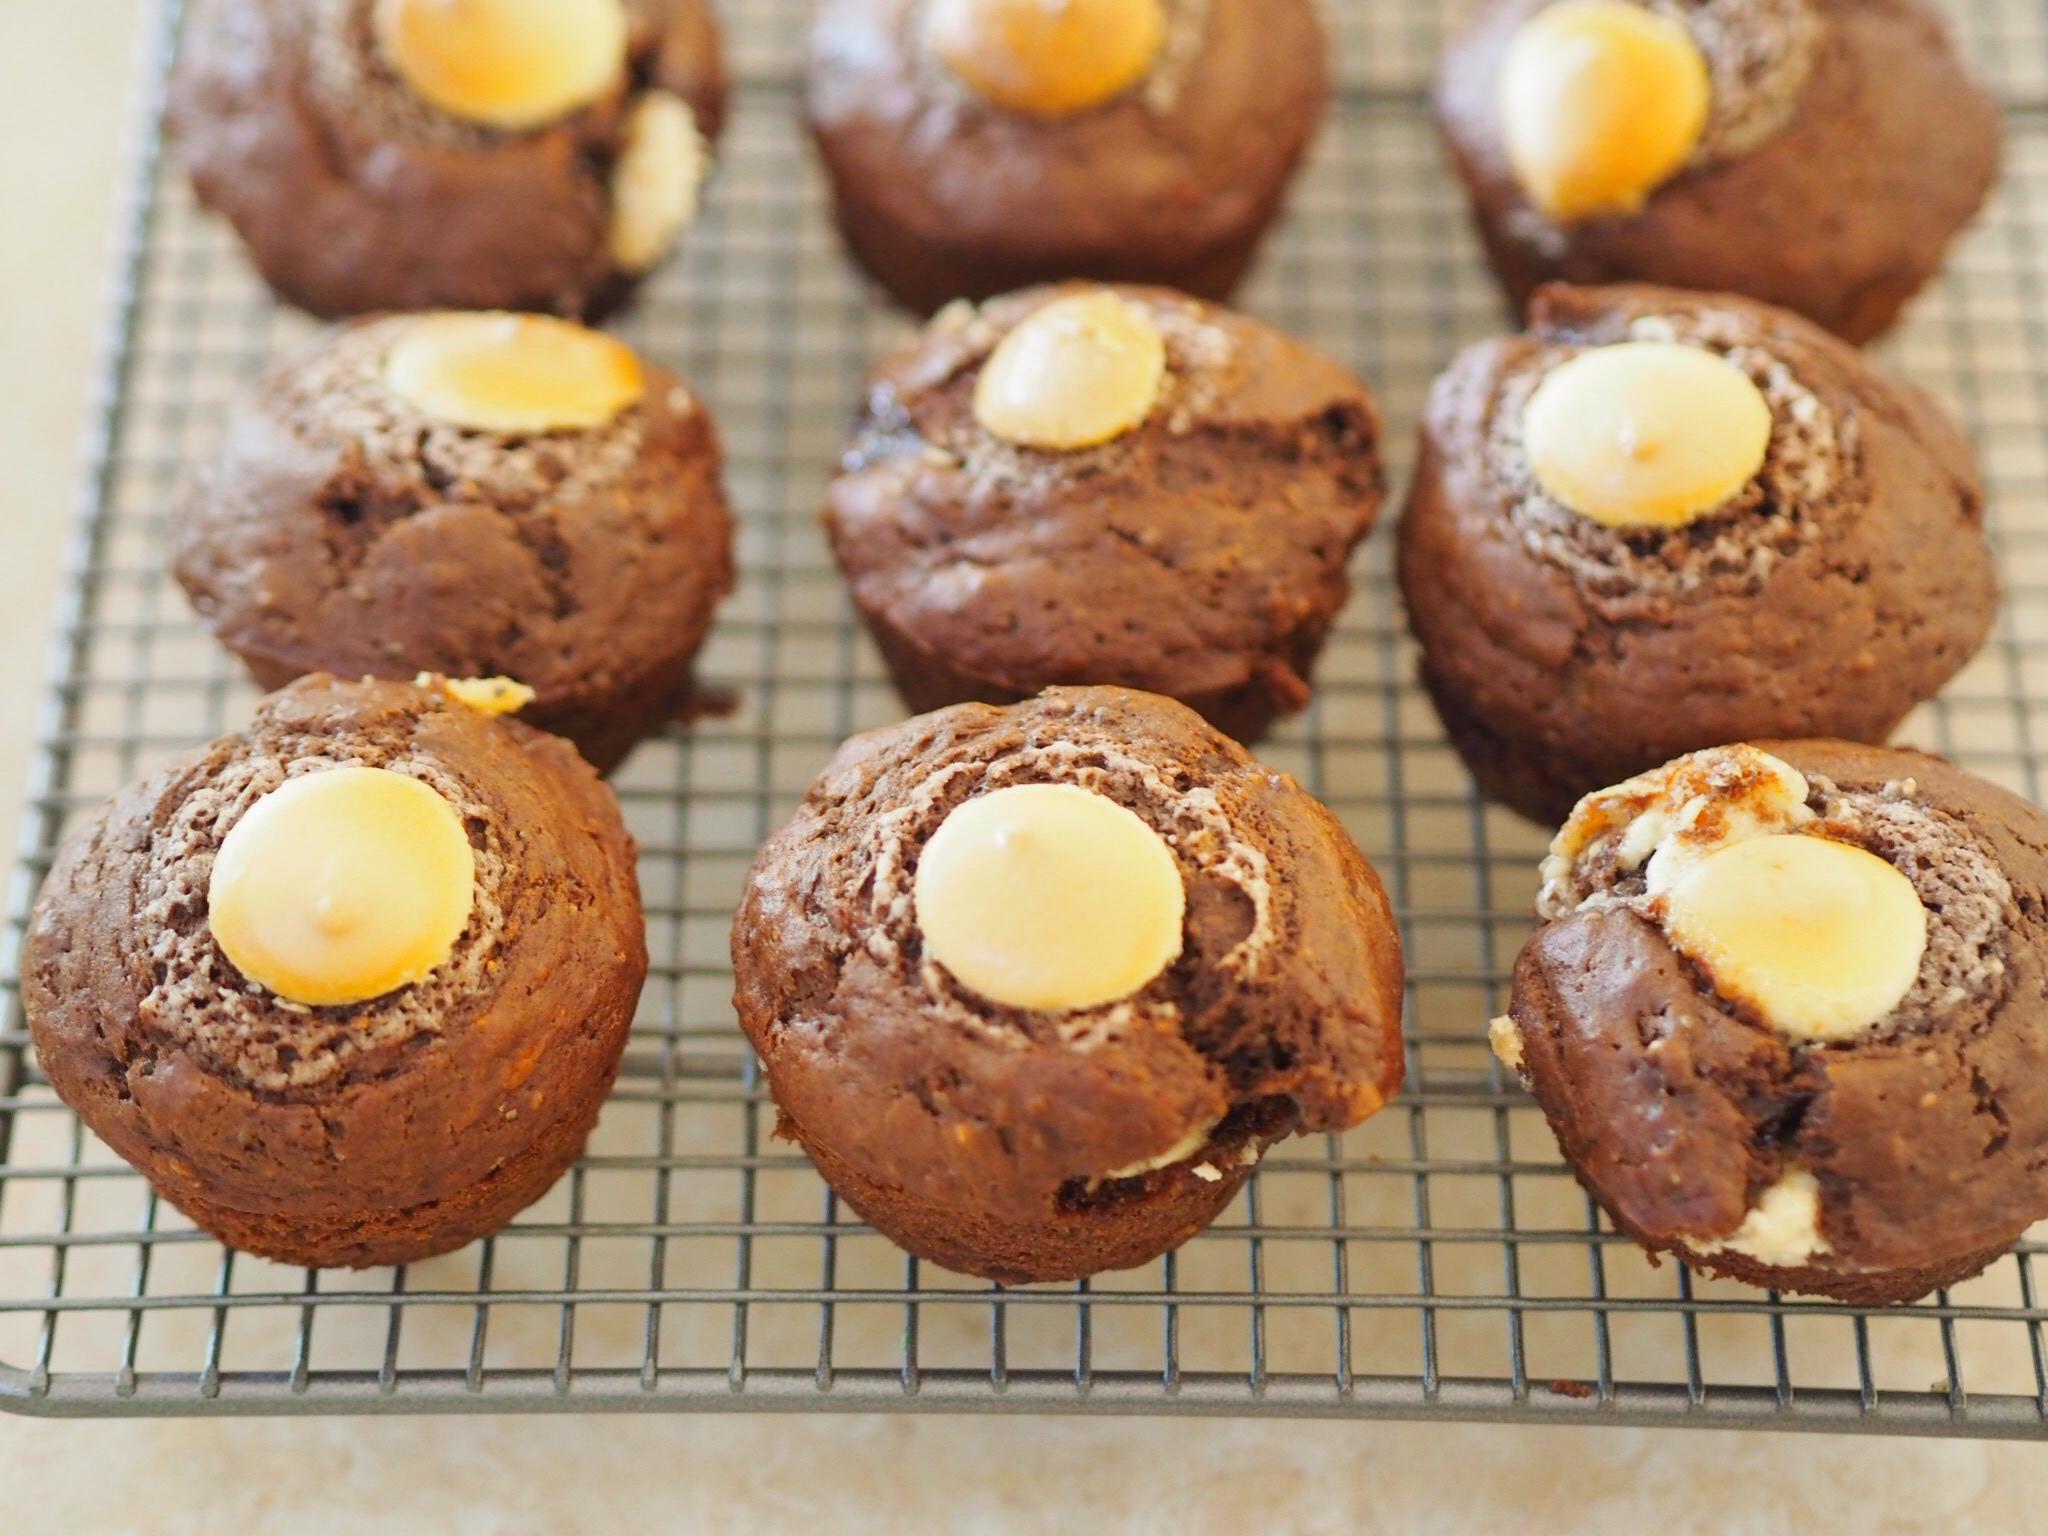 Chocolate Banana Muffins with White Chocolate Chips